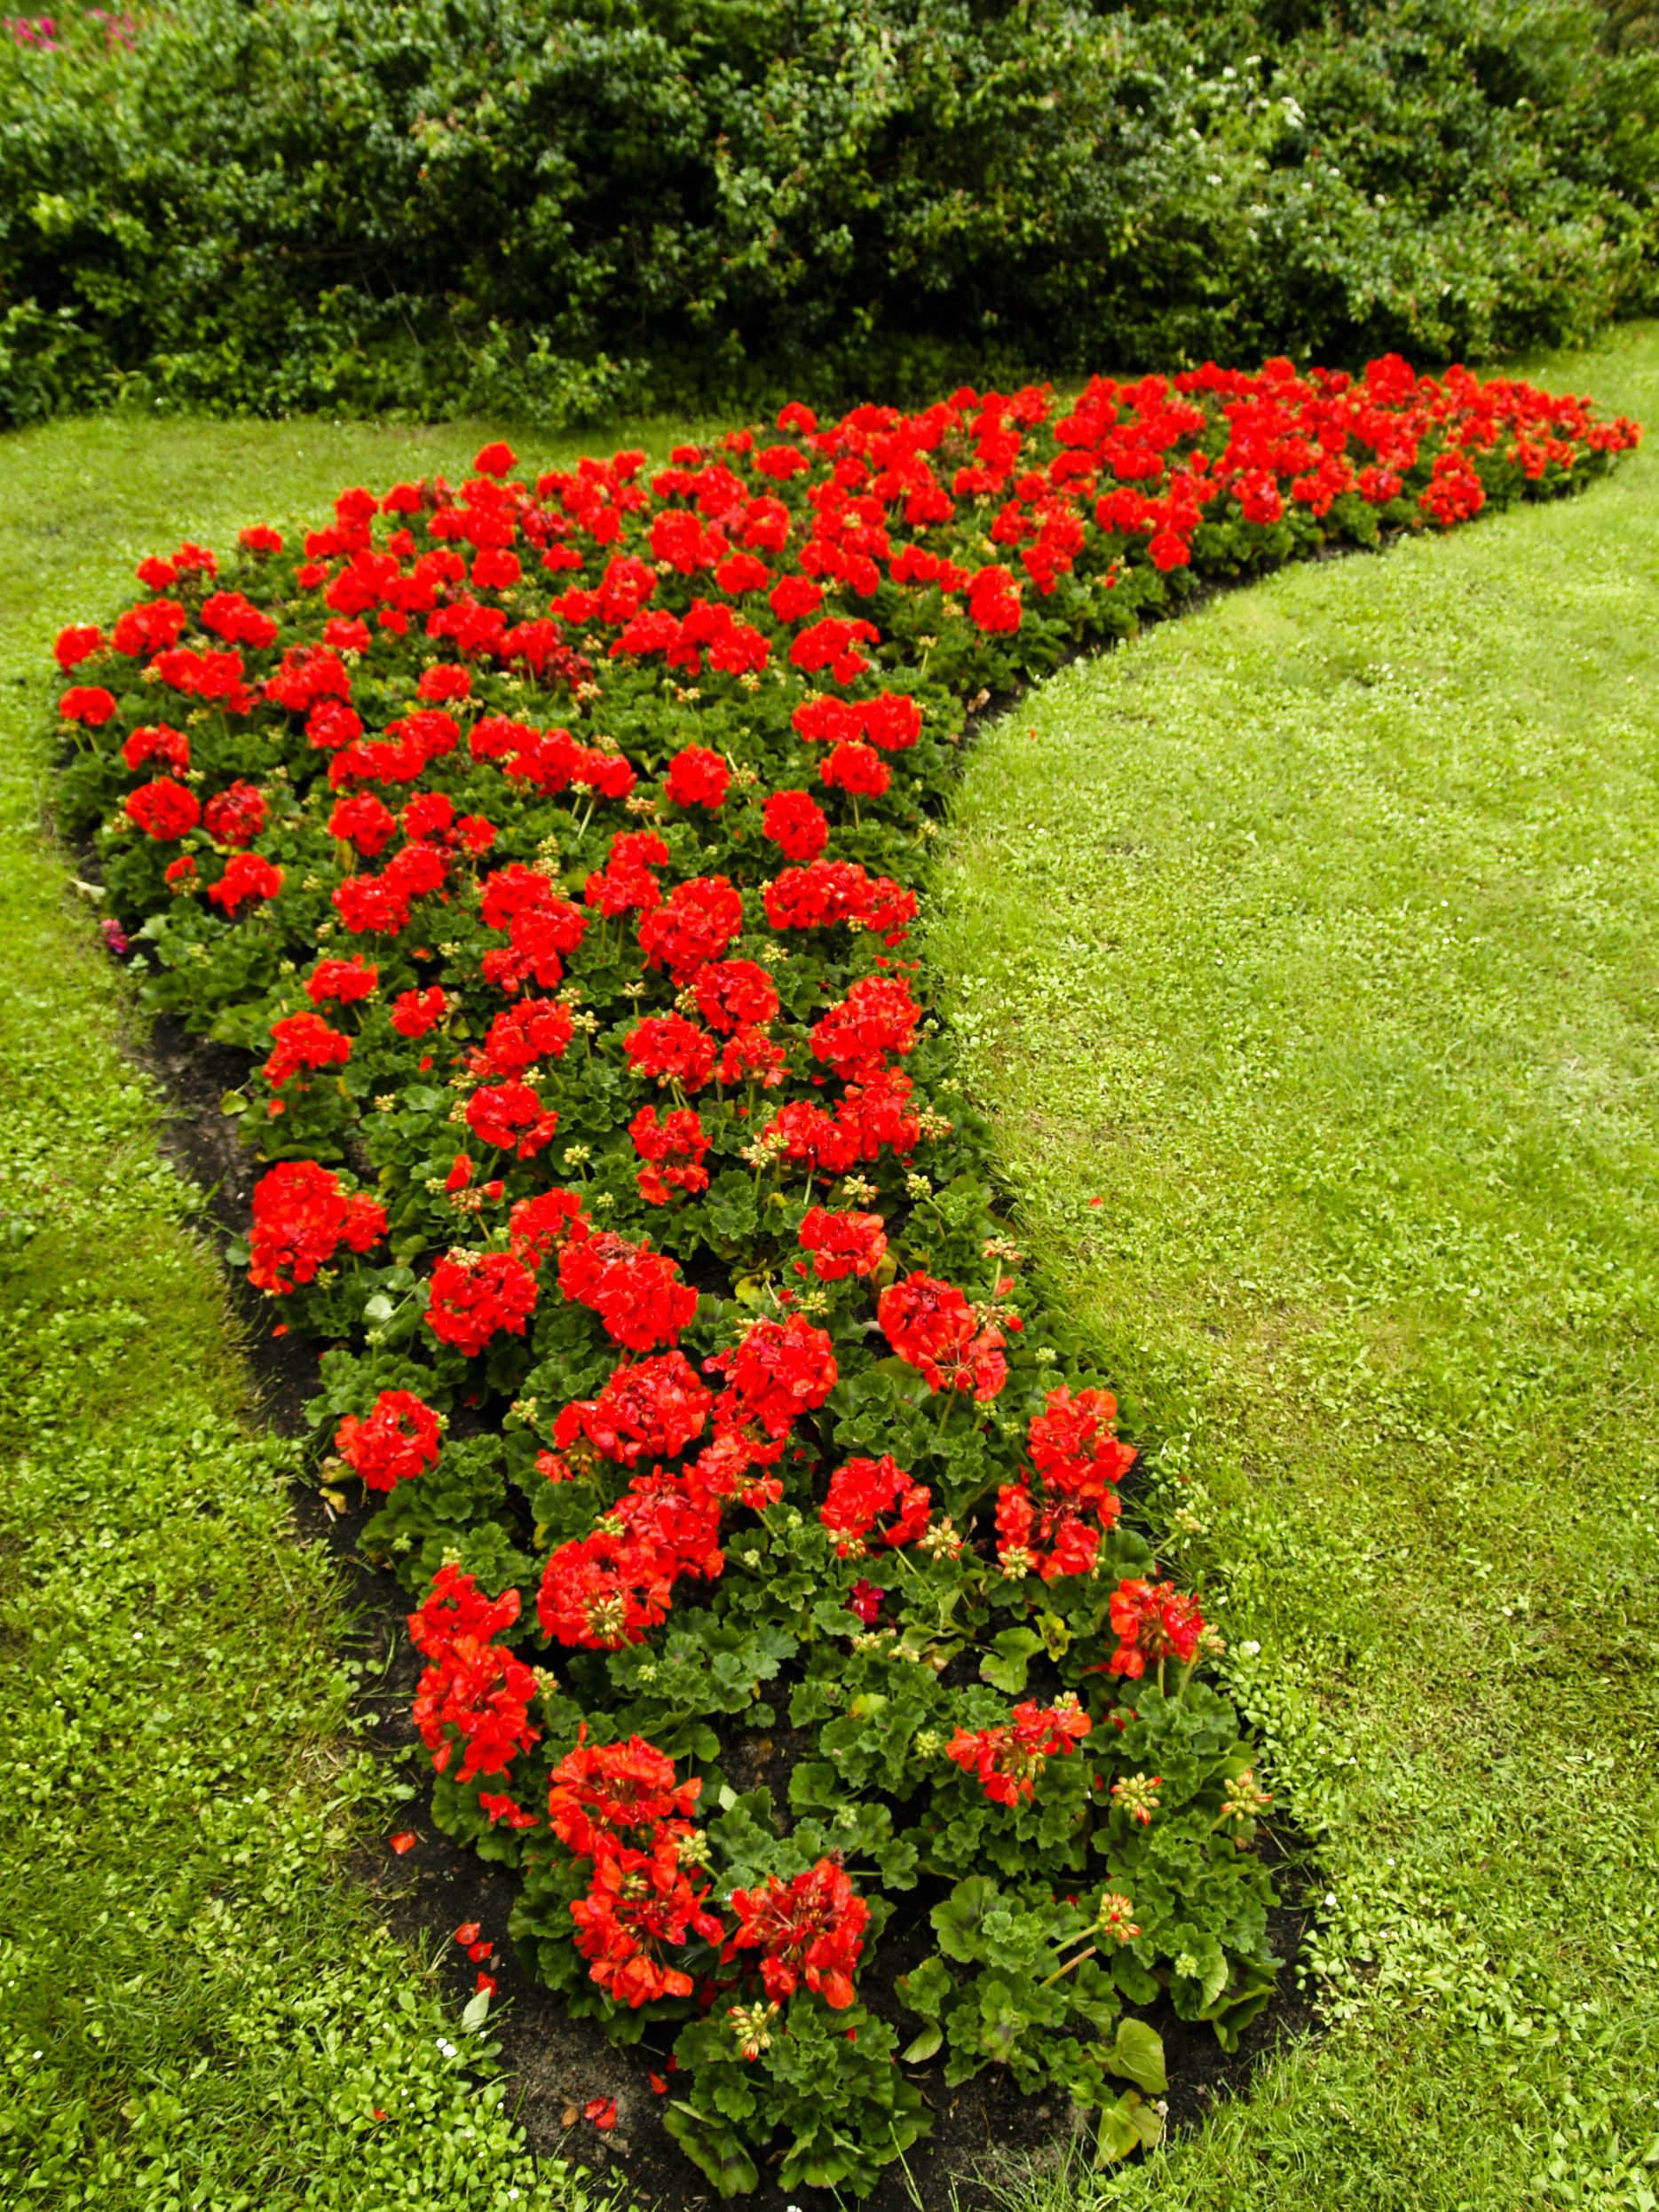 Red Geraniums Geraniums Garden Red Geraniums Flower Beds 400 x 300